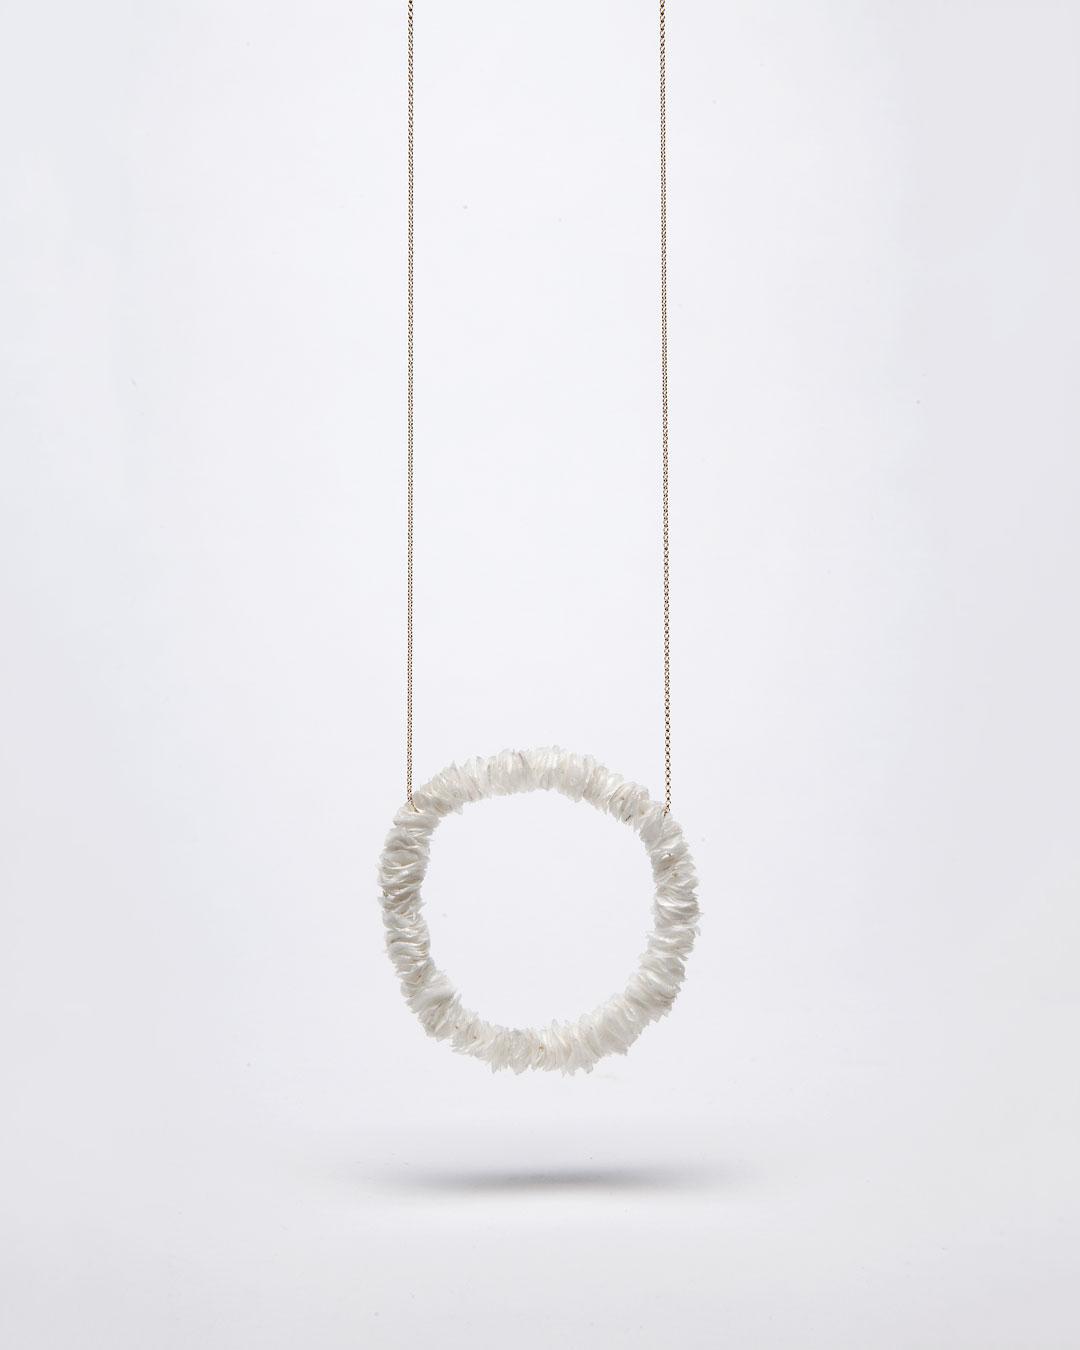 Annamaria Leiste, Meeresraunen 2 (Sea Whisper 2), 2014, necklace; gold, fish scales, 370 x 170 x 10 mm, €885